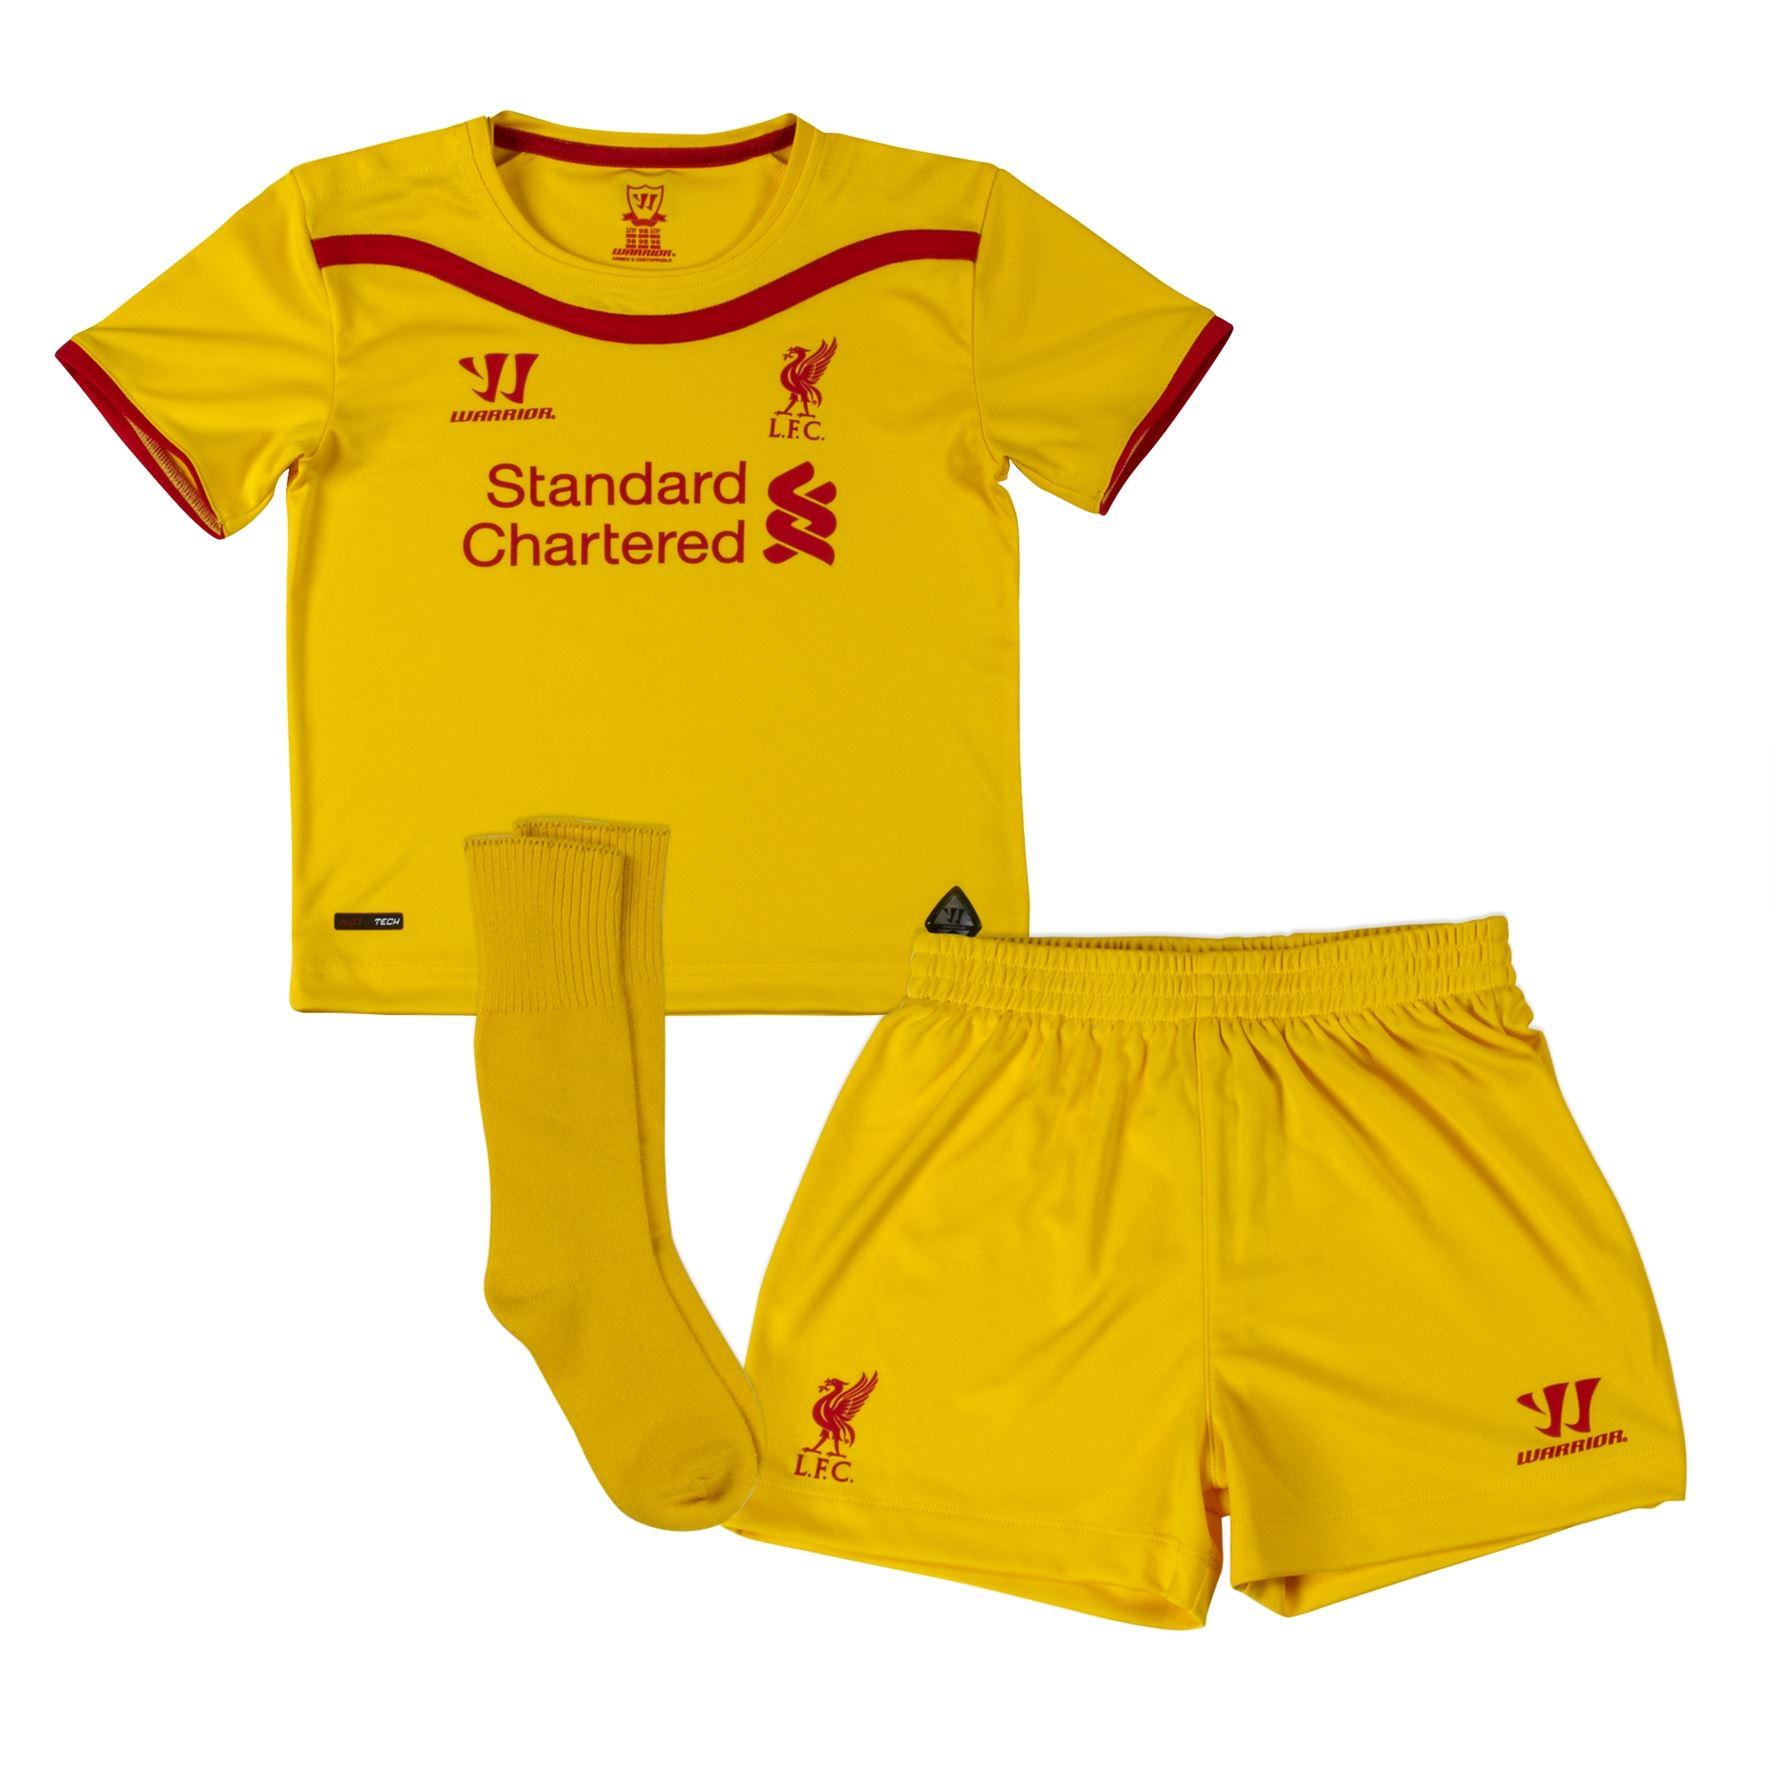 dab073157d3 ... Warrior Liverpool FC Away Mini Kit 2014 2015 Infants Yellow Football  Soccer Baby ...